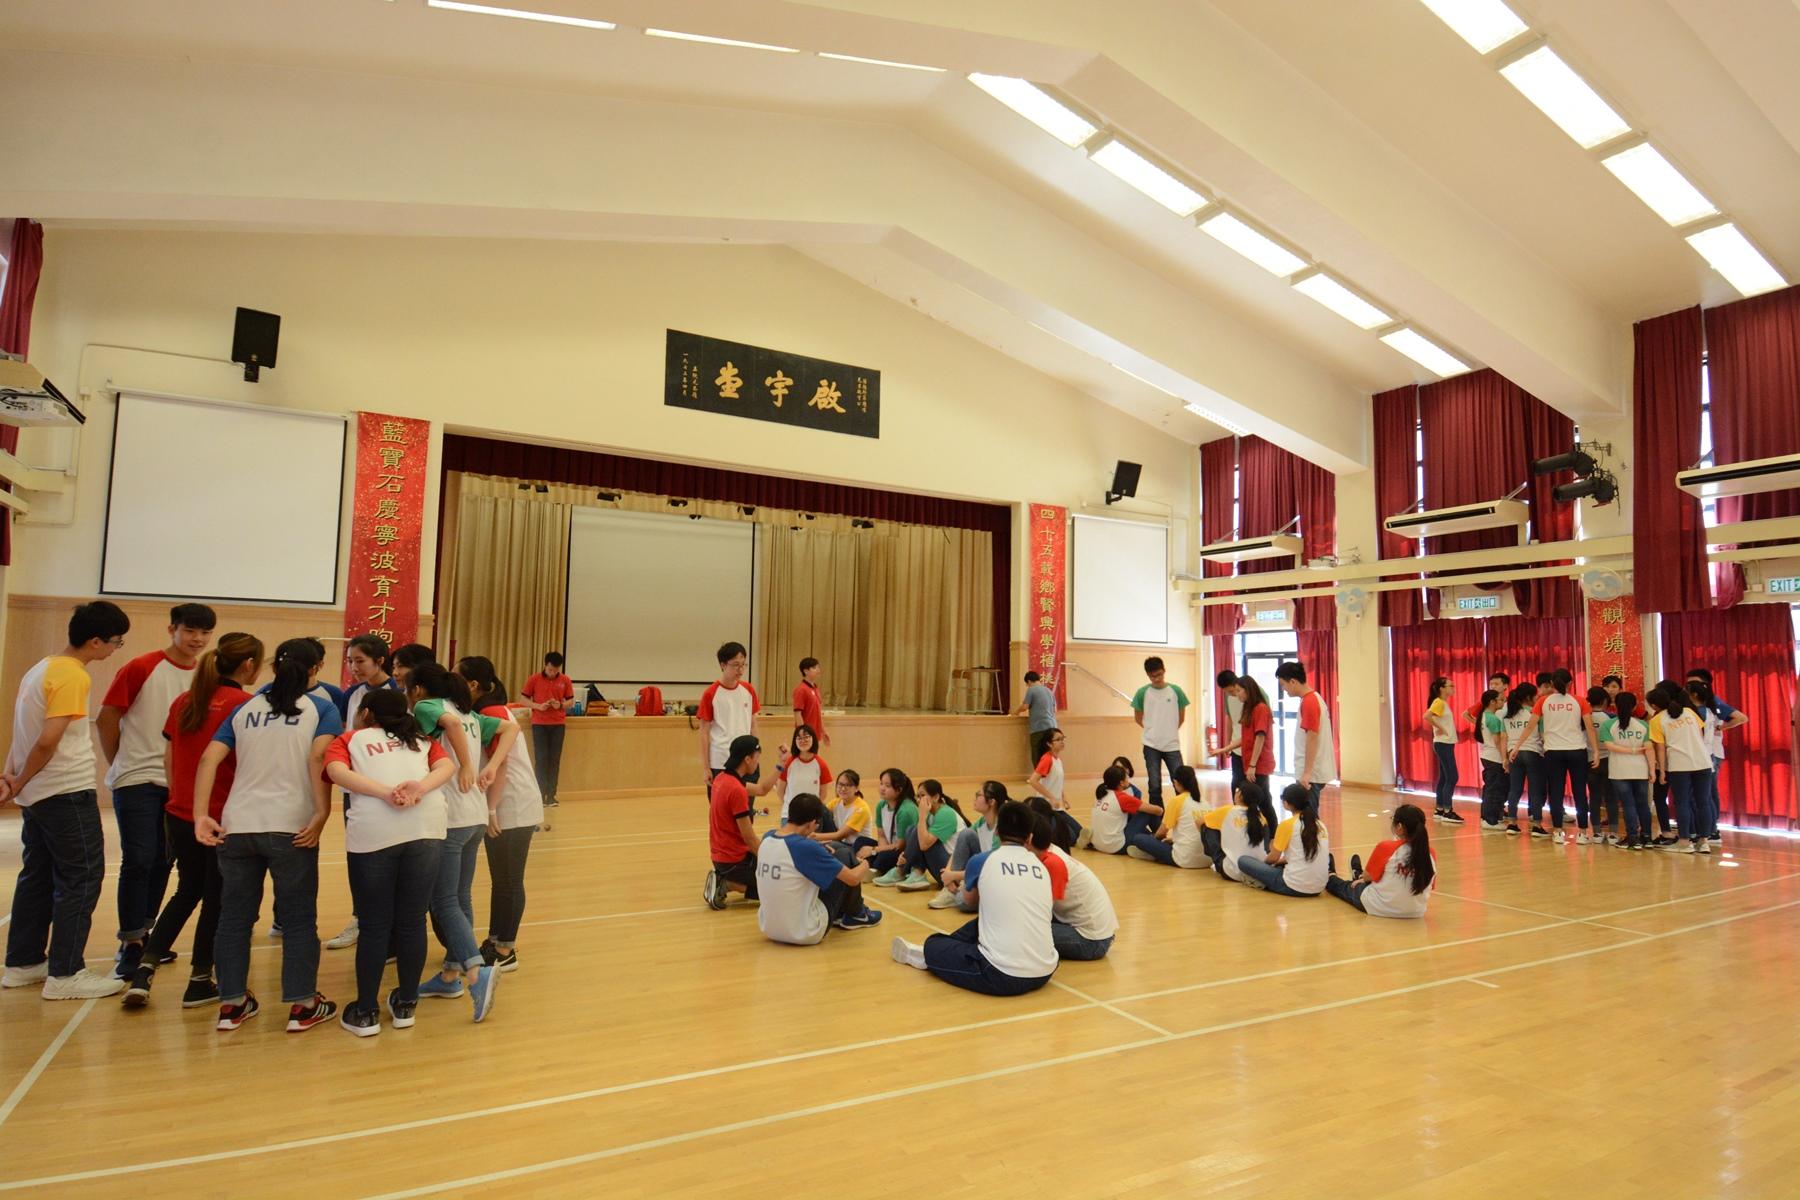 http://npc.edu.hk/sites/default/files/dsc_3172.jpg